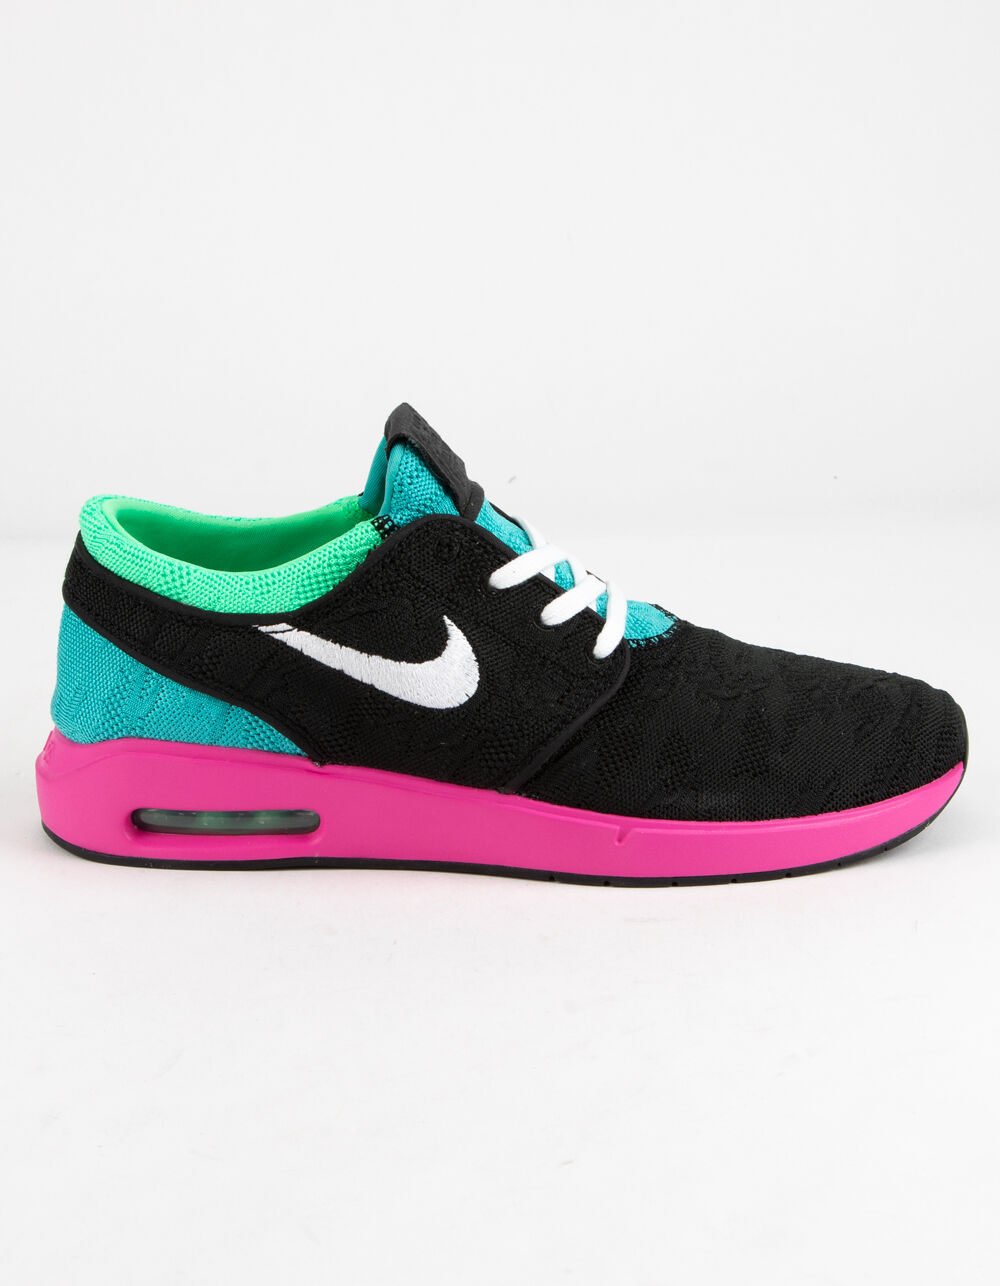 NIKE SB Air Max Janoski Black & Vert Electro Shoes